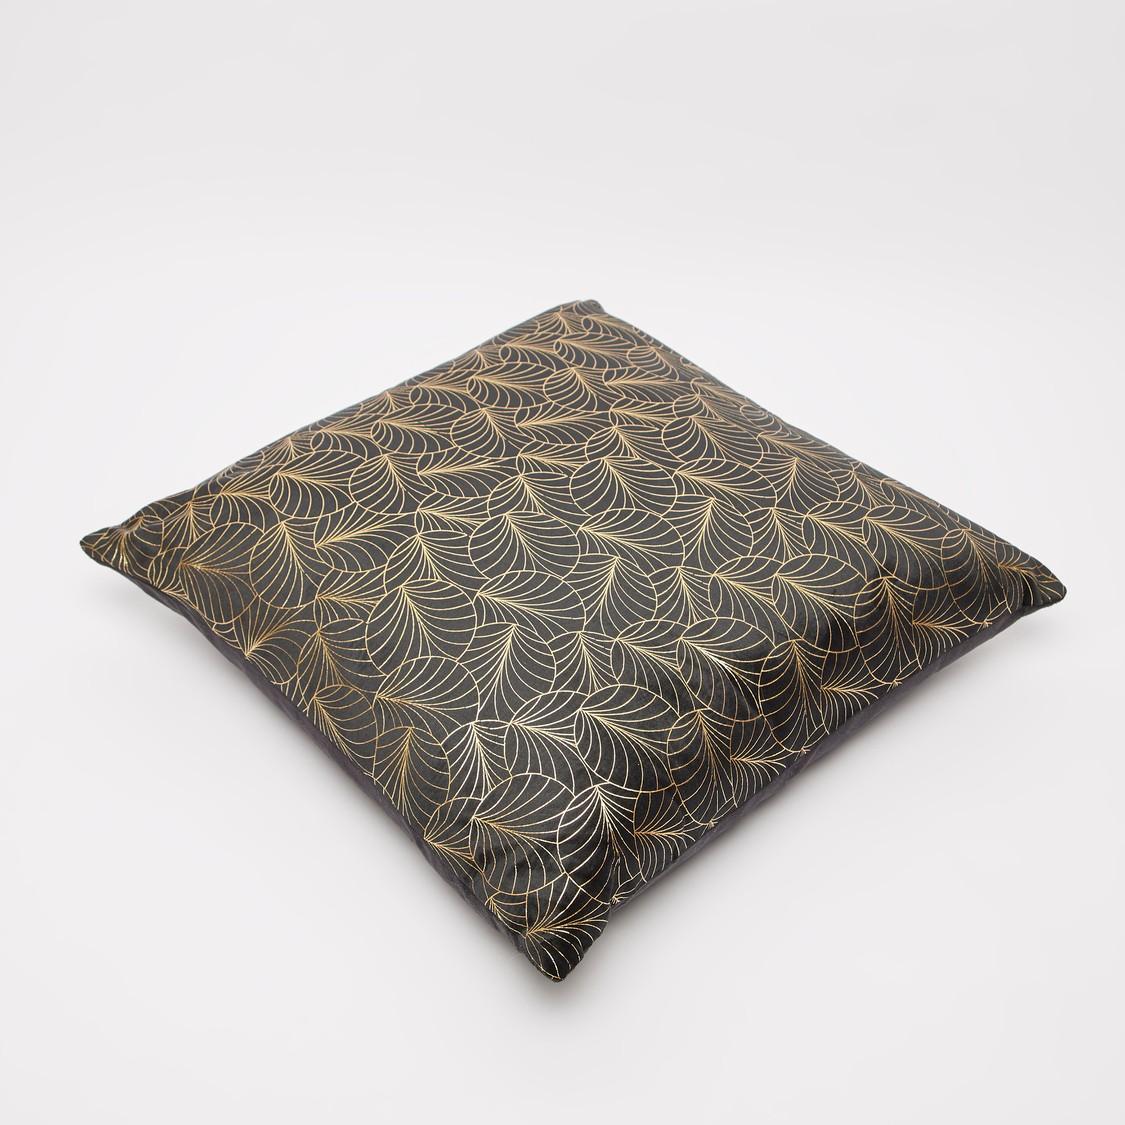 Printed Filled Cushion - 45x45 cms